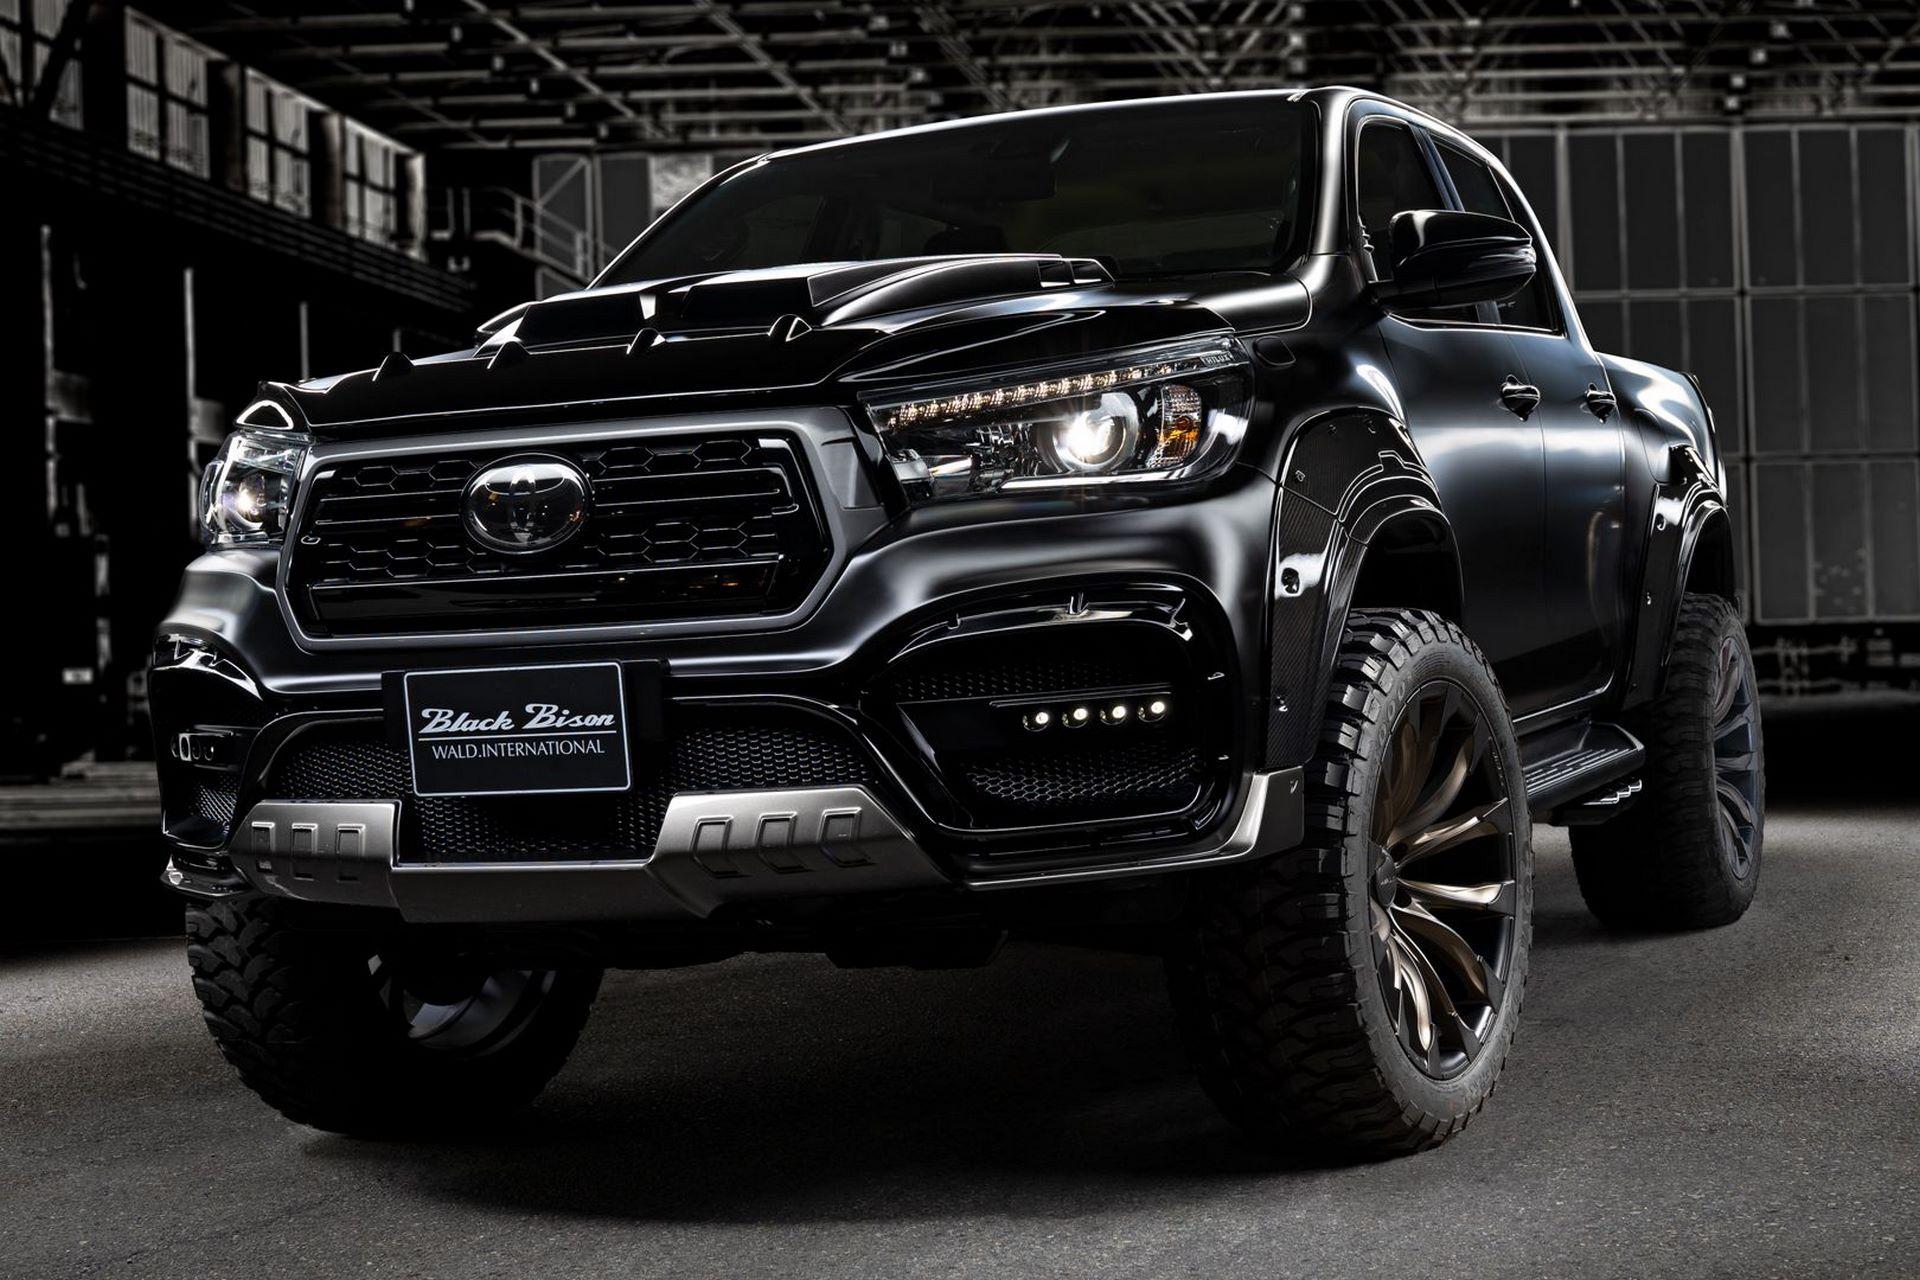 Toyota-Hilux-Black-Bison-by-Wald-International-4